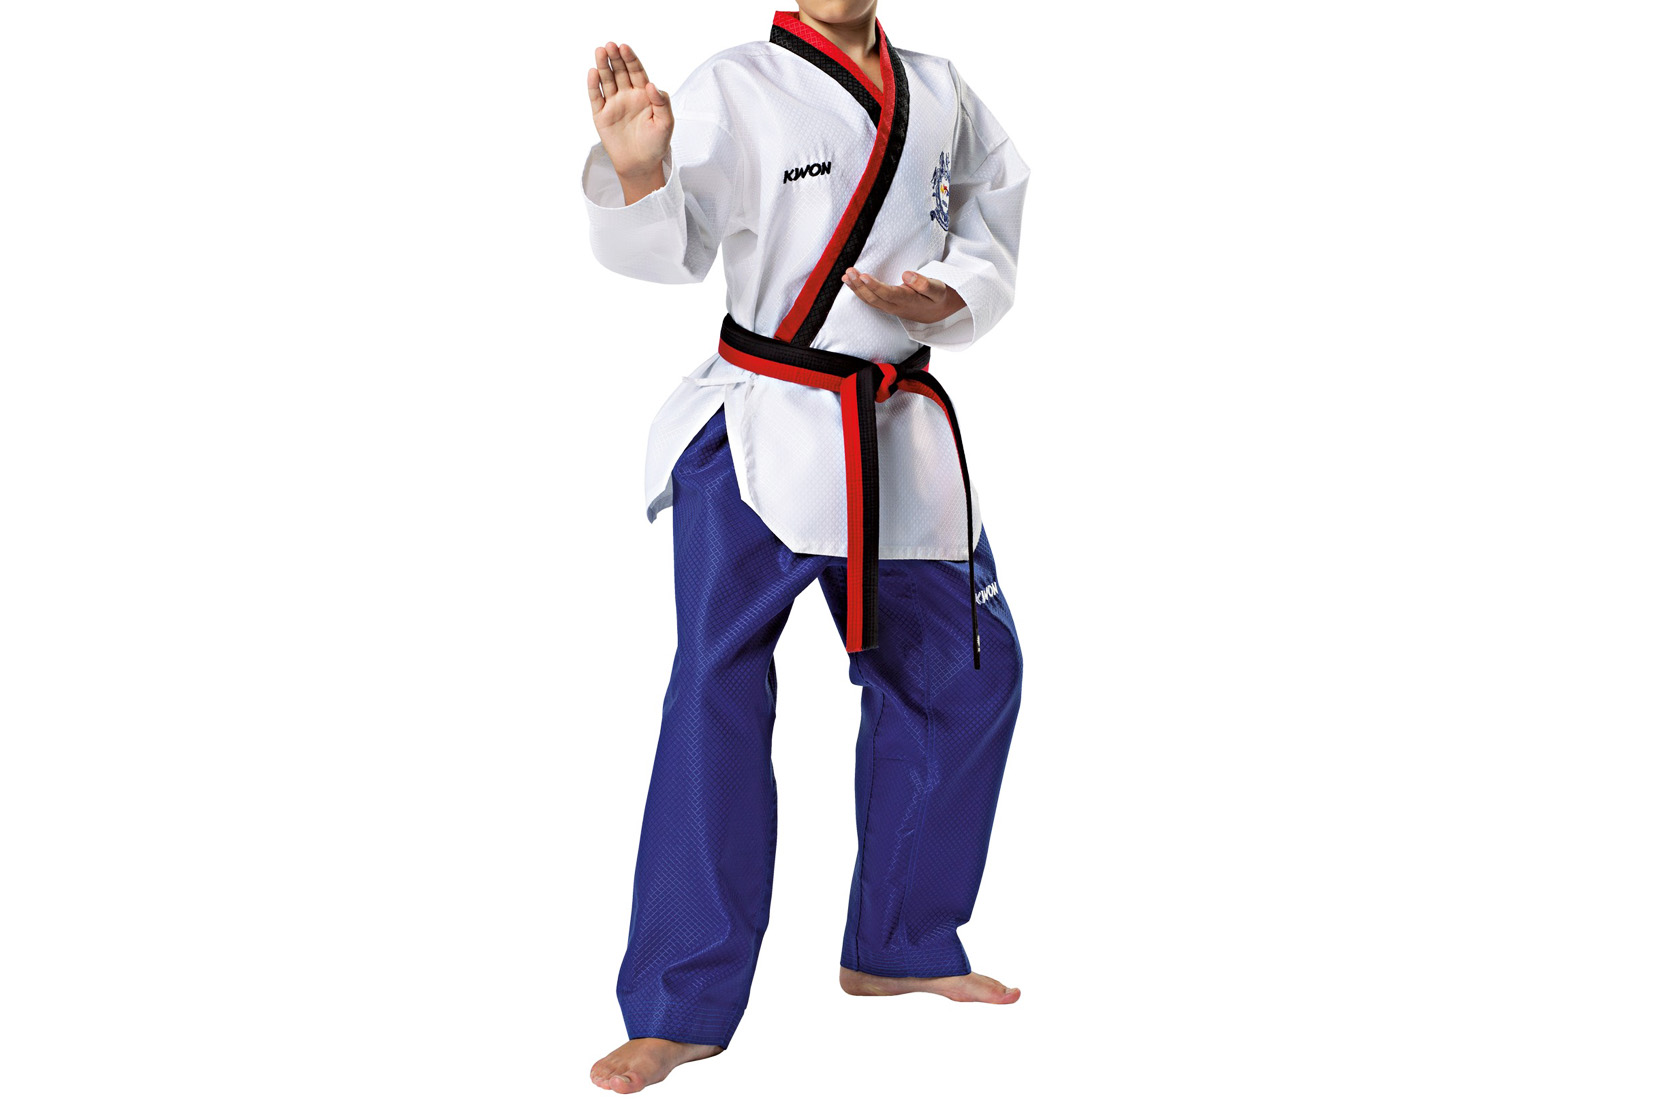 Kimono Poomsae - Garçons, KWON